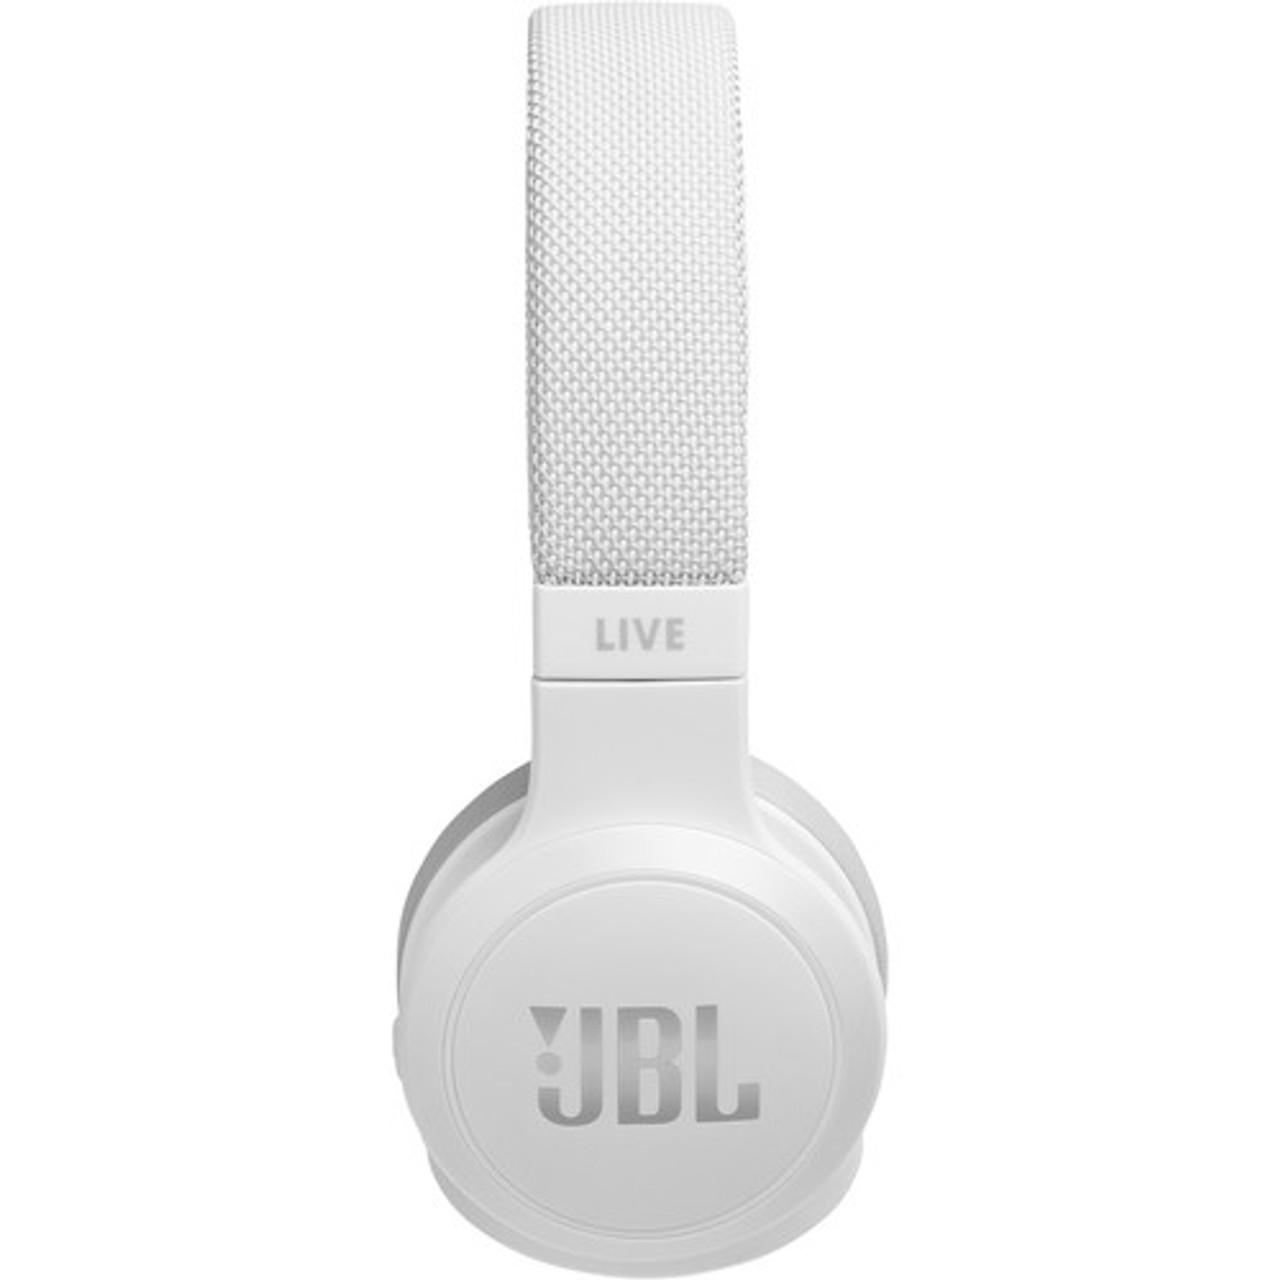 JBL JBLLIVE400BTWTAM-Z LIVE 400BT Wireless On-Ear Headphones, White – Certified Refurbished